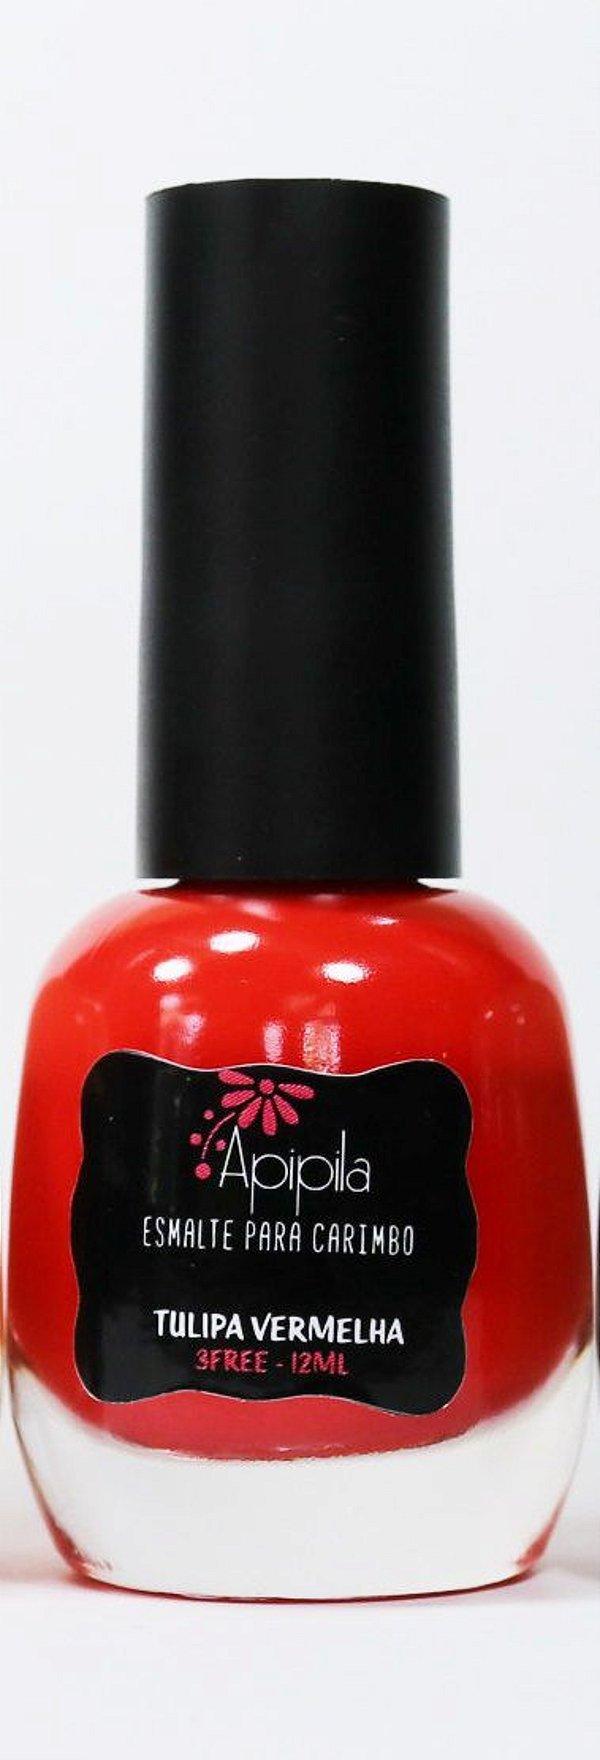 Esmalte Carimbo Apipila - Tulipa Vermelha